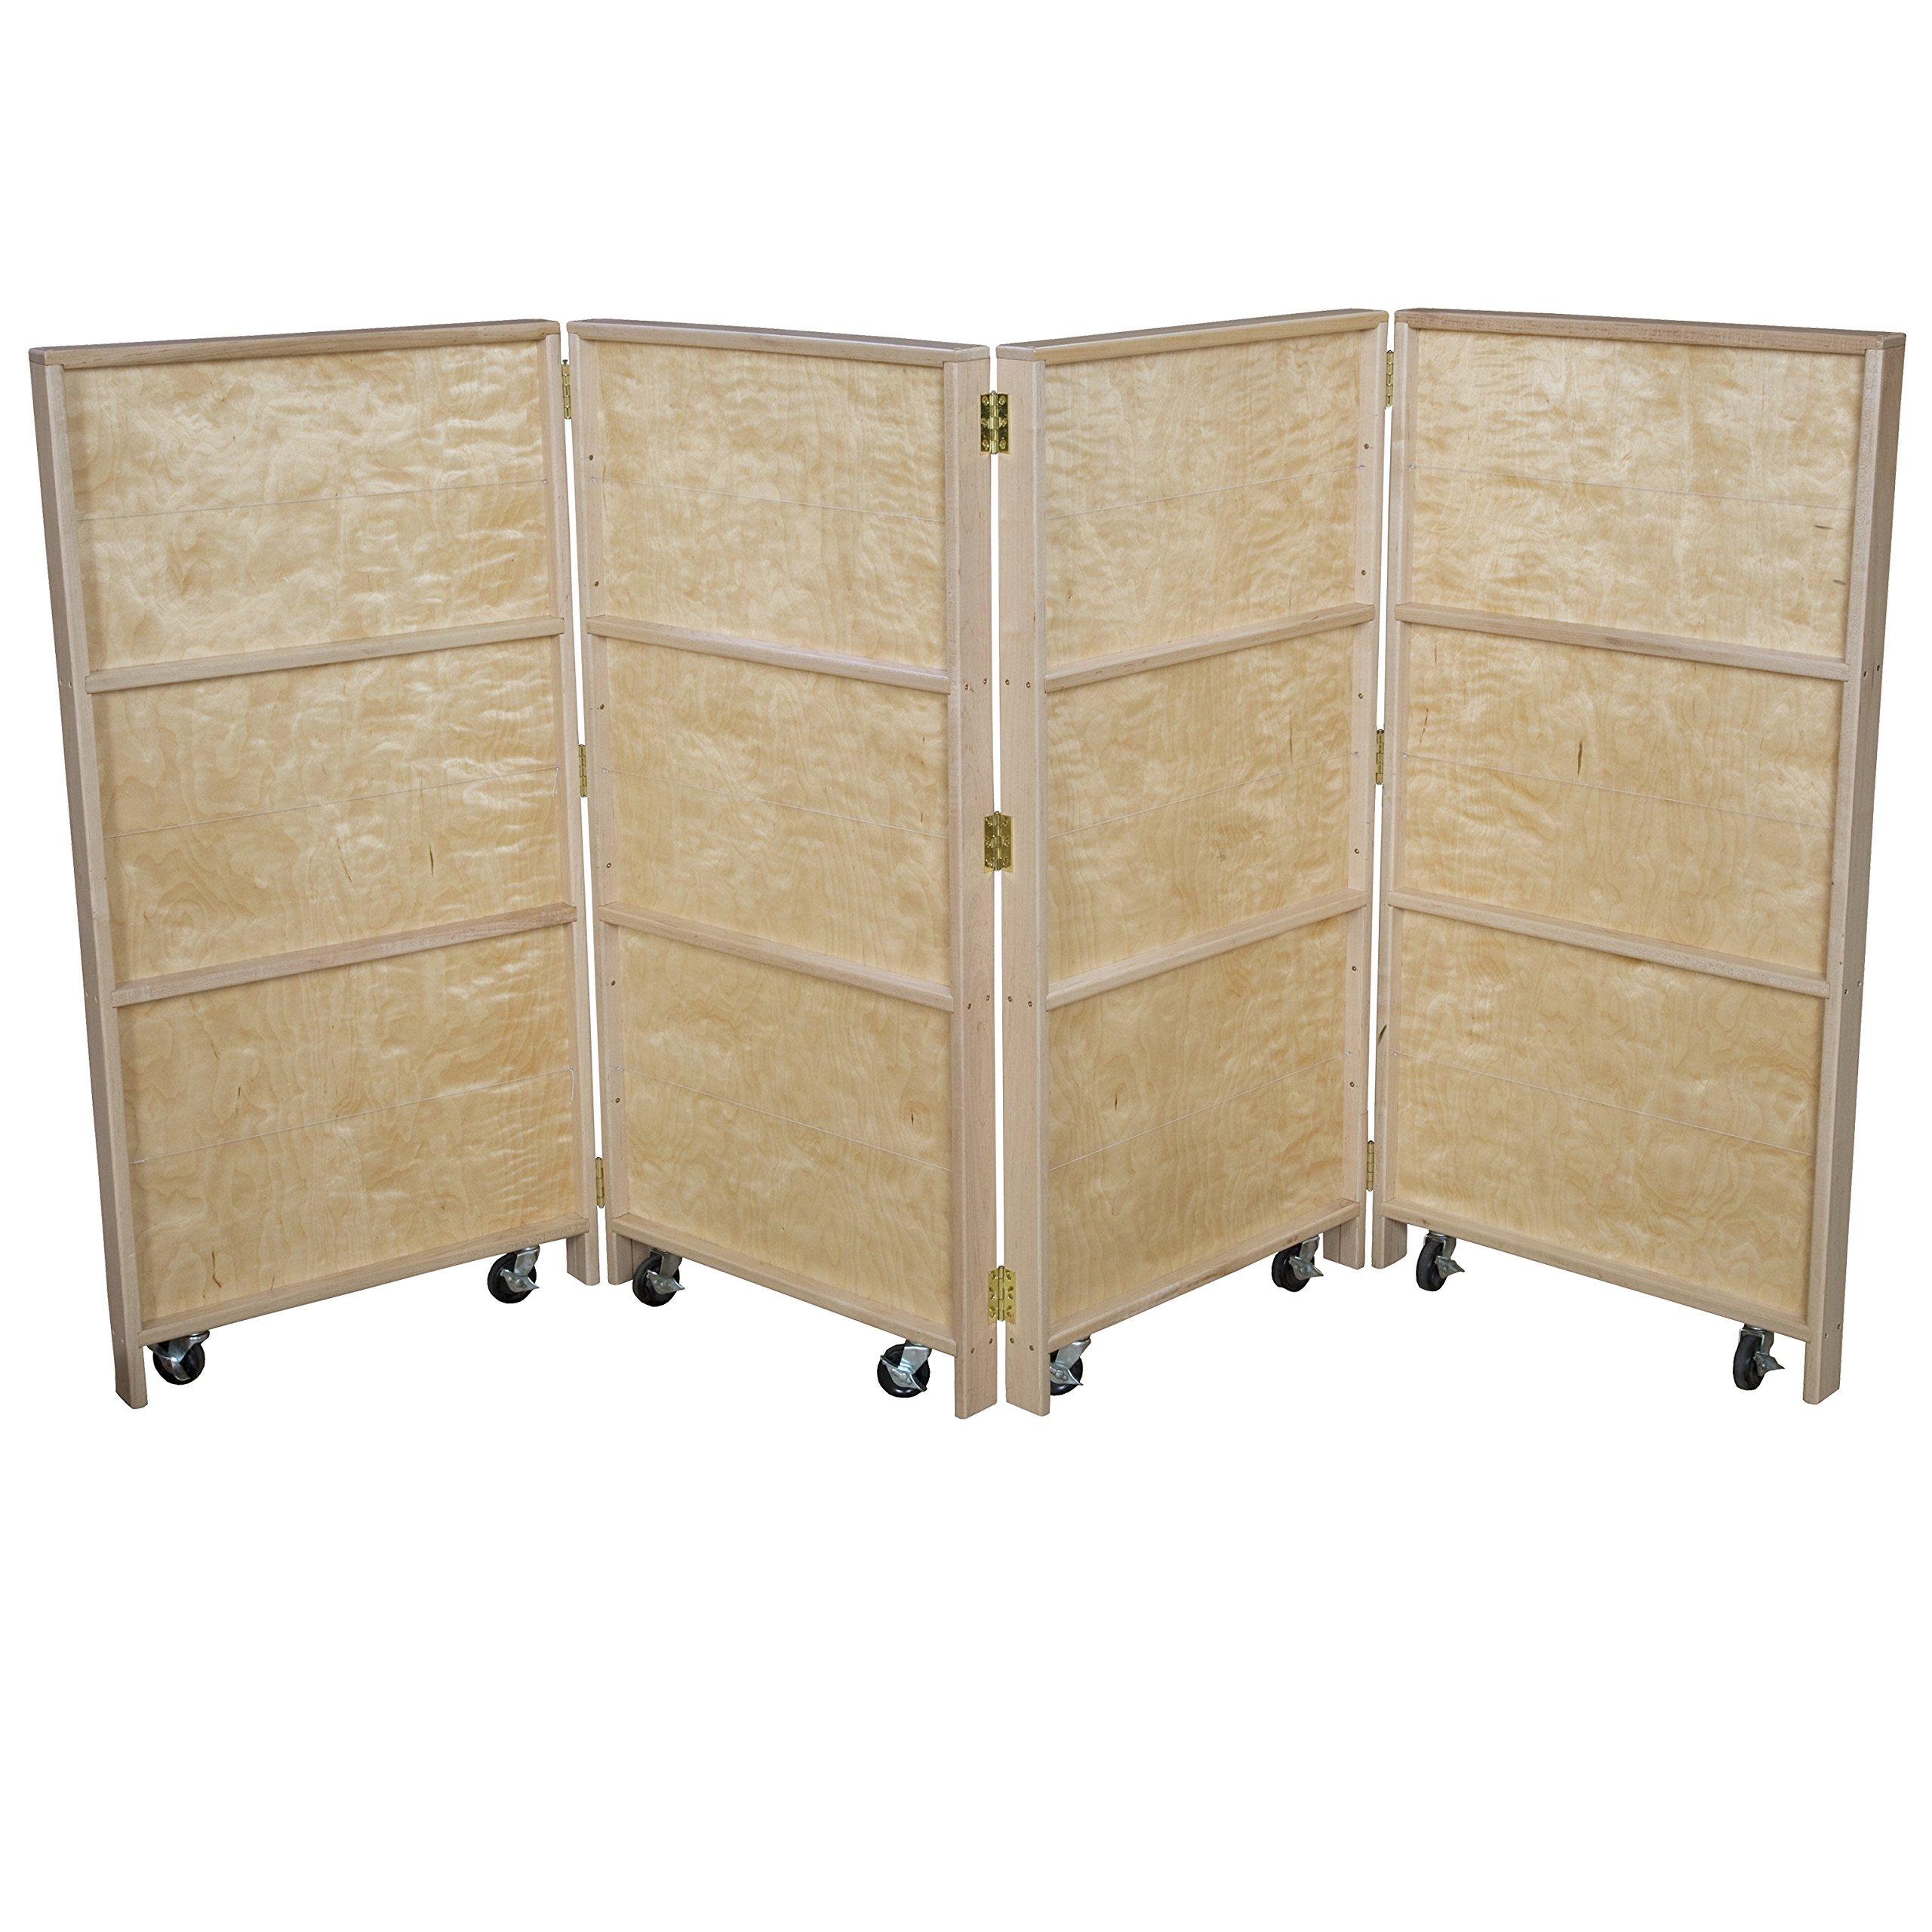 Wood Designs 990682 Mobile Bookcase